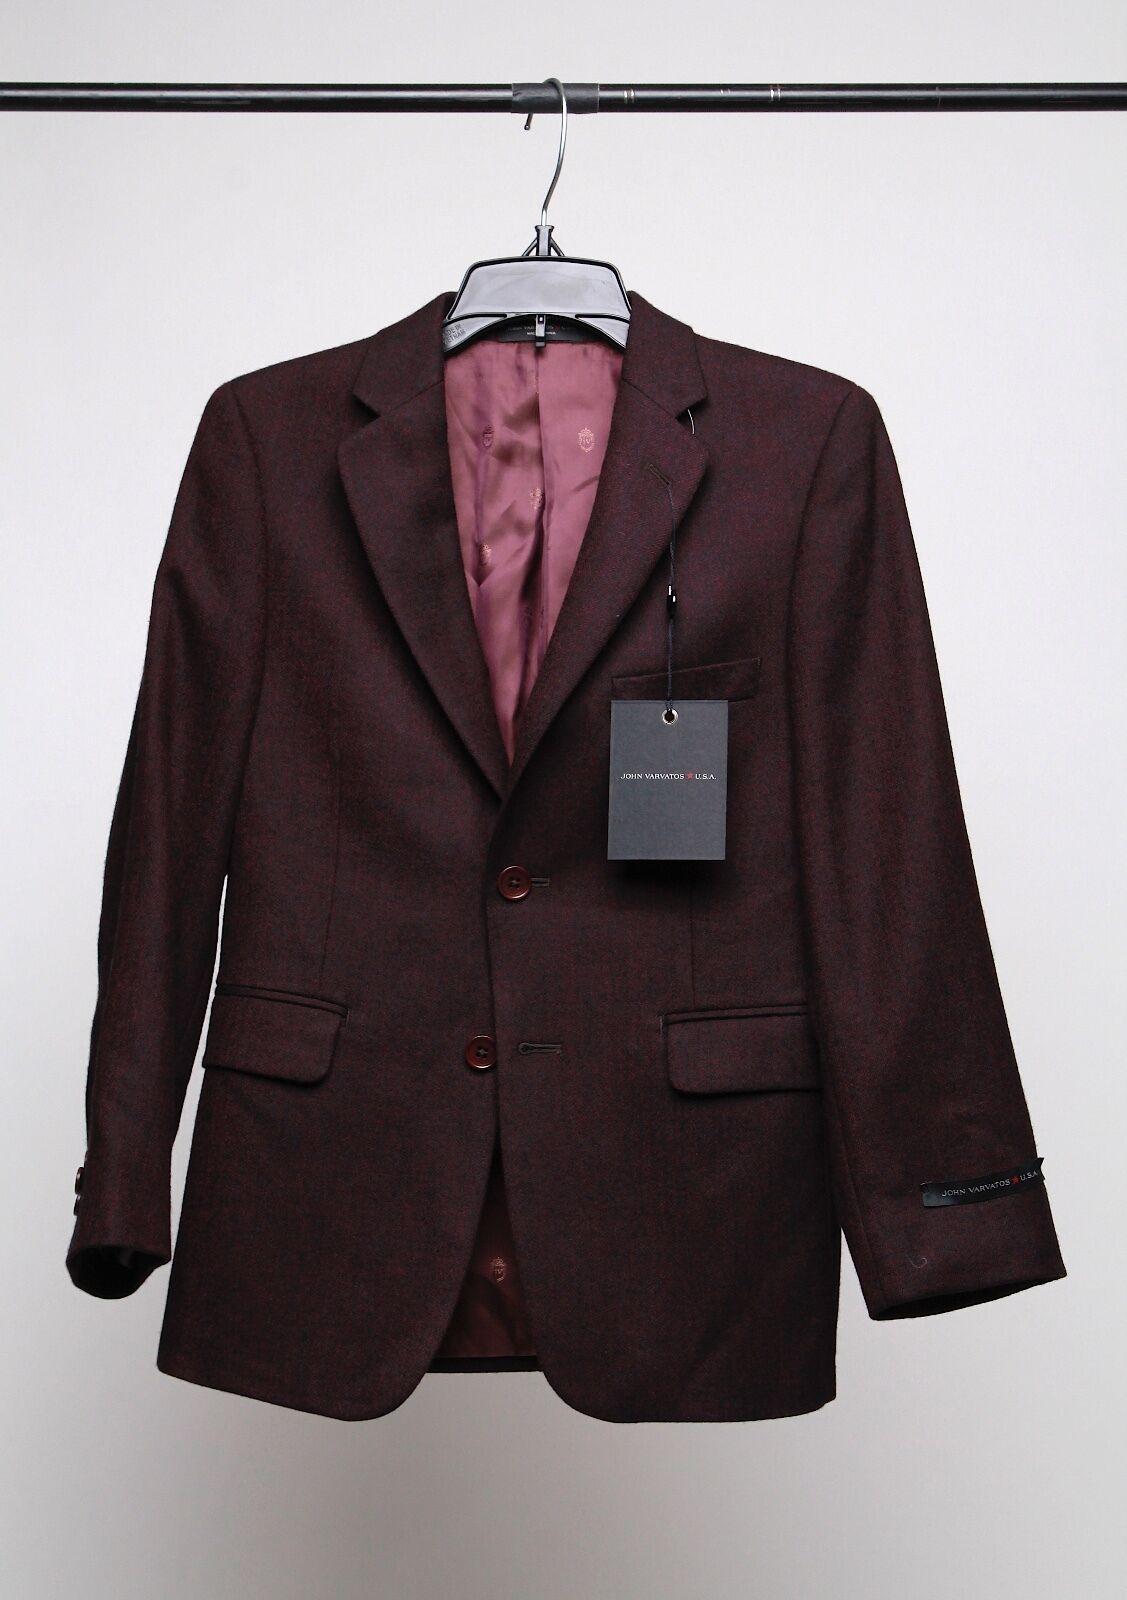 John Varvatos Boys' Herringbone Sport Coat Burgundy Size 8R